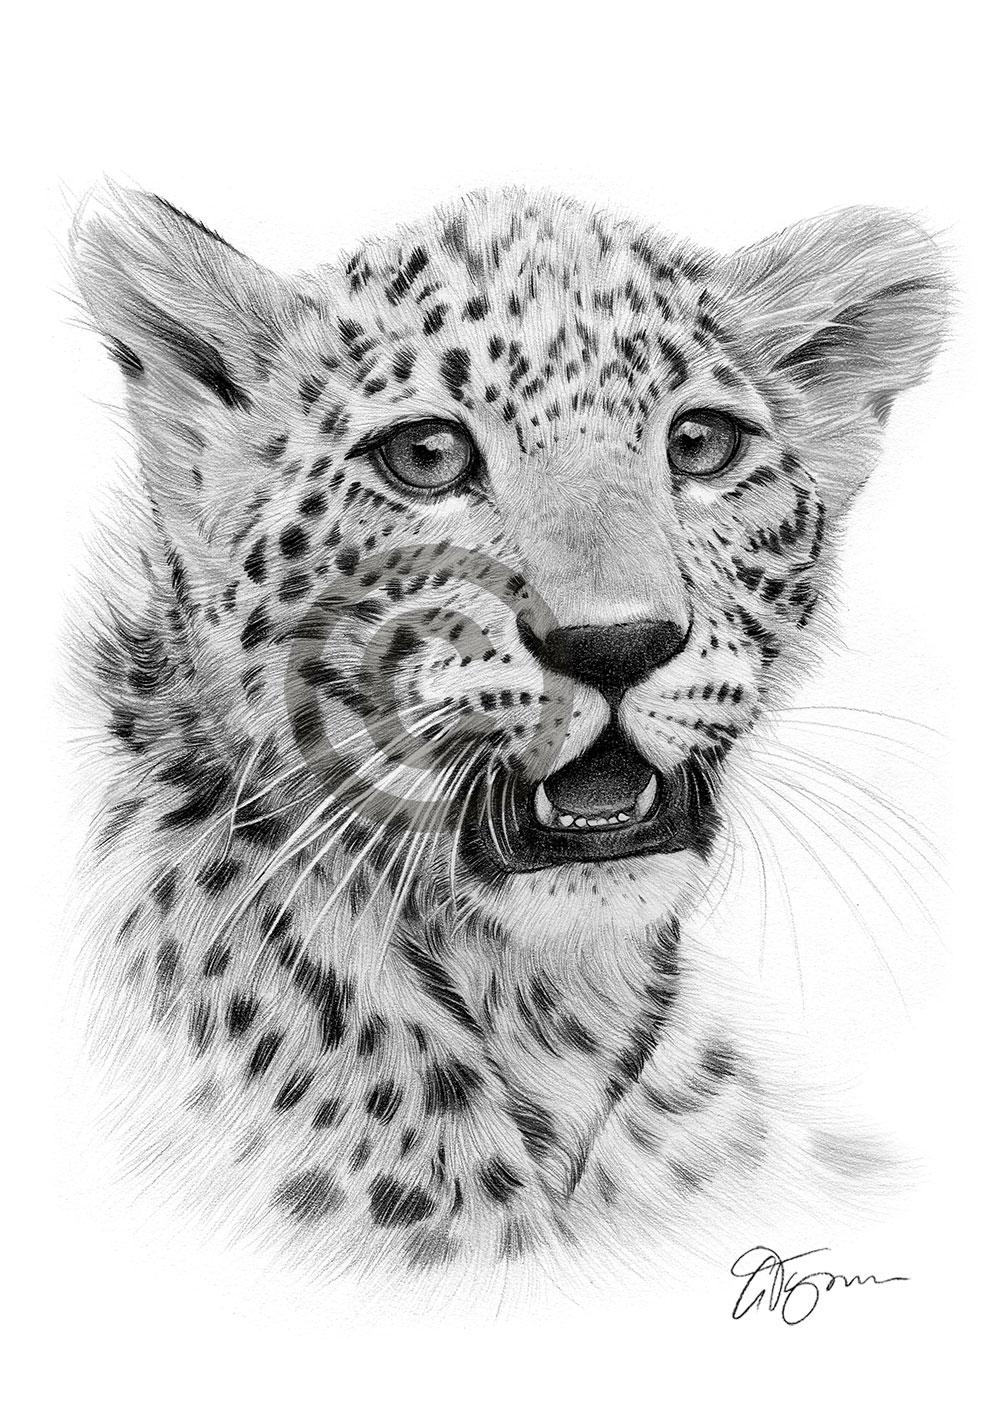 Leopard Cub Pencil Drawing Artwork Print A3 A4 Sizes Signed By Artist G Tymon Ebay